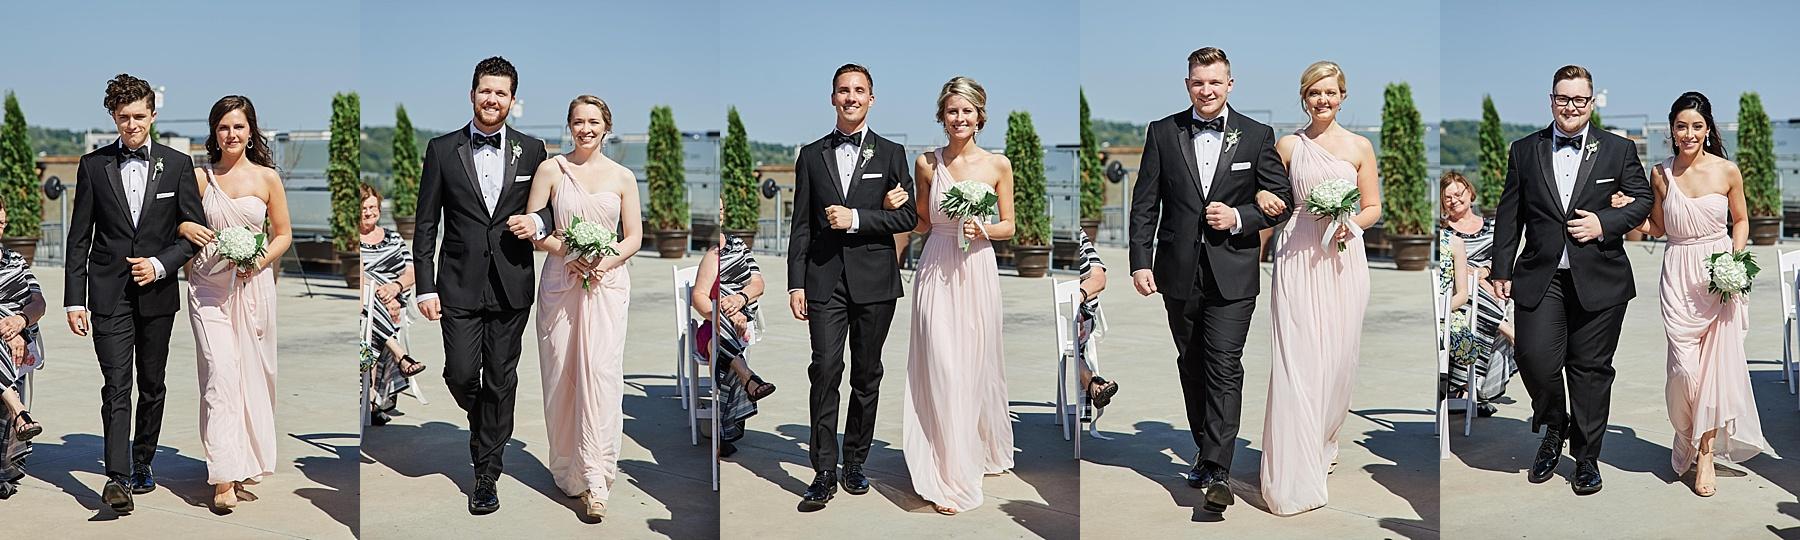 ABULAE-Wedding-Saint-paul-MN-Josh-Sofia-Wedding-Mears-Park_0745.jpg